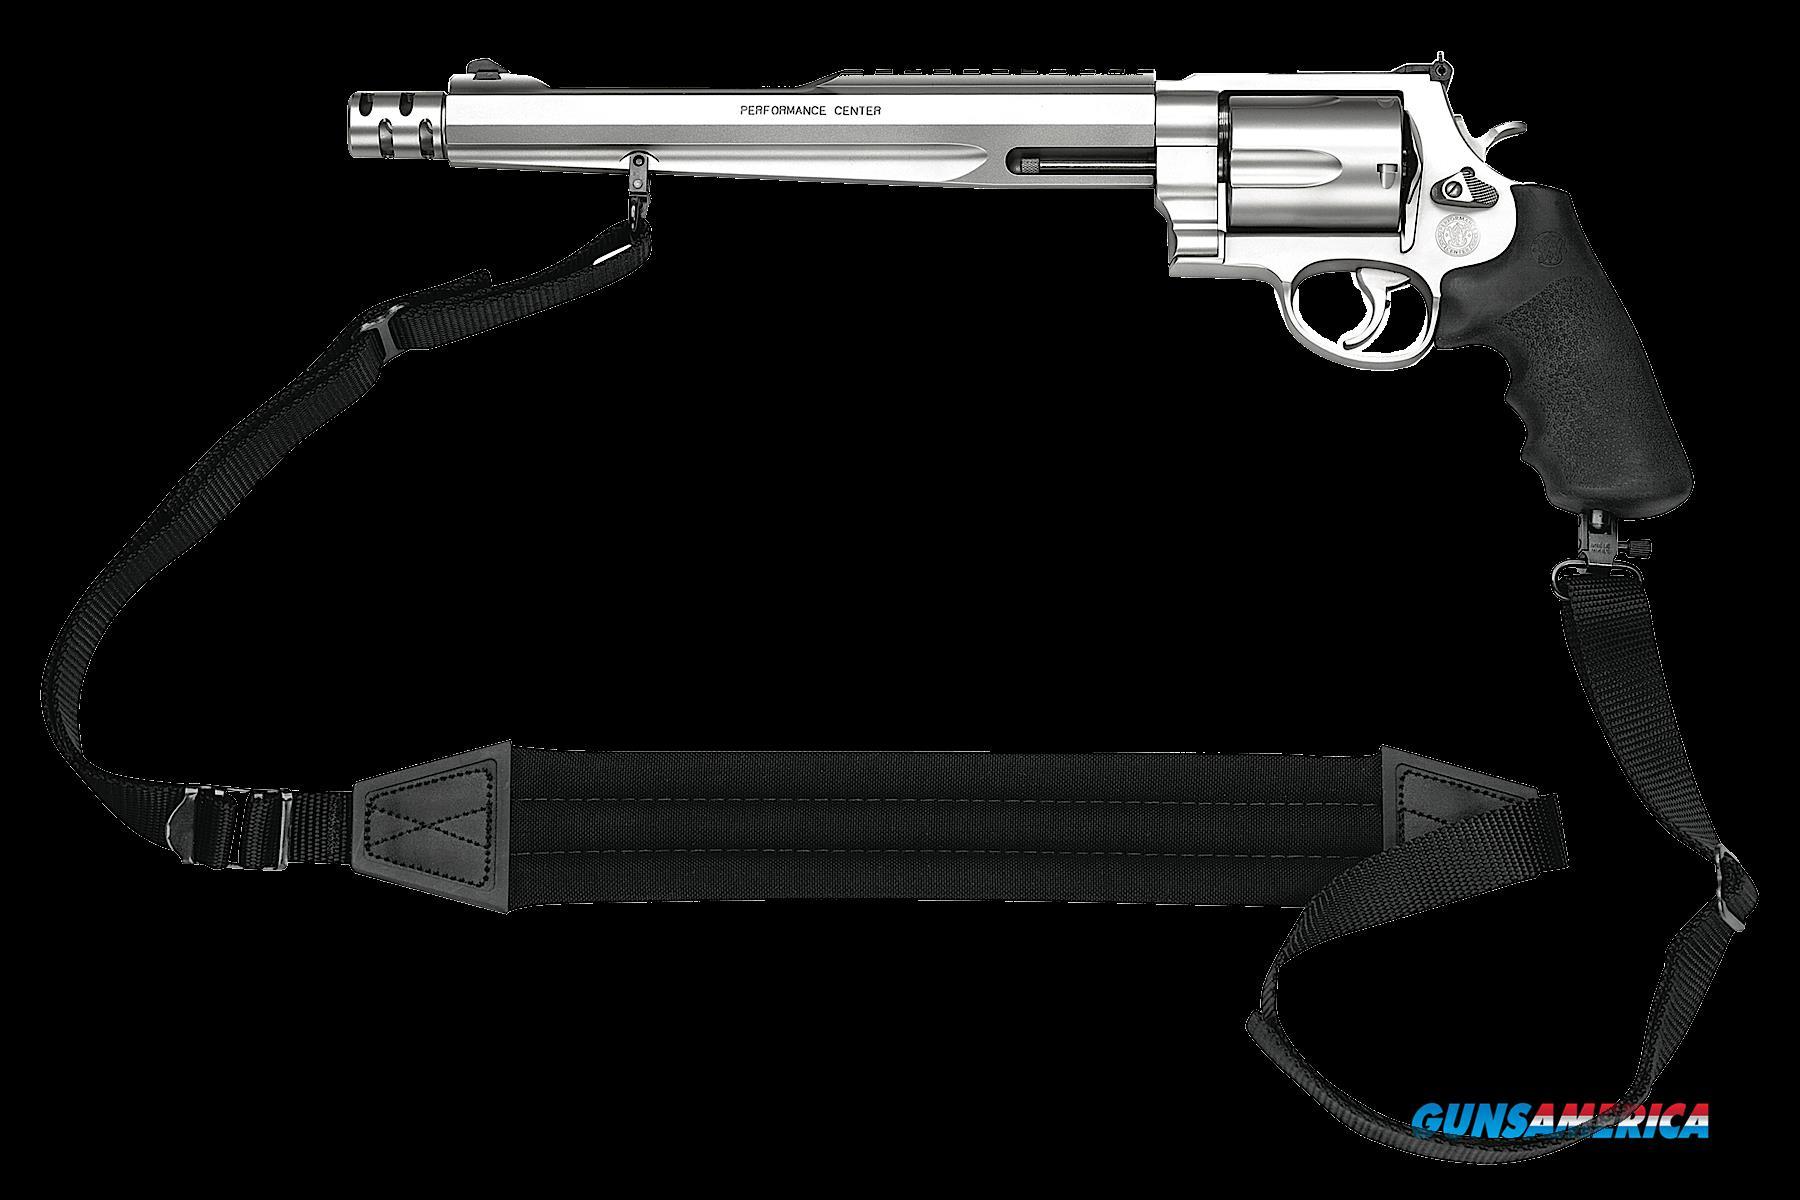 Smith & Wesson 500, S&w M500       170231 Pfmc  500 10.5   Ss  Guns > Pistols > 1911 Pistol Copies (non-Colt)